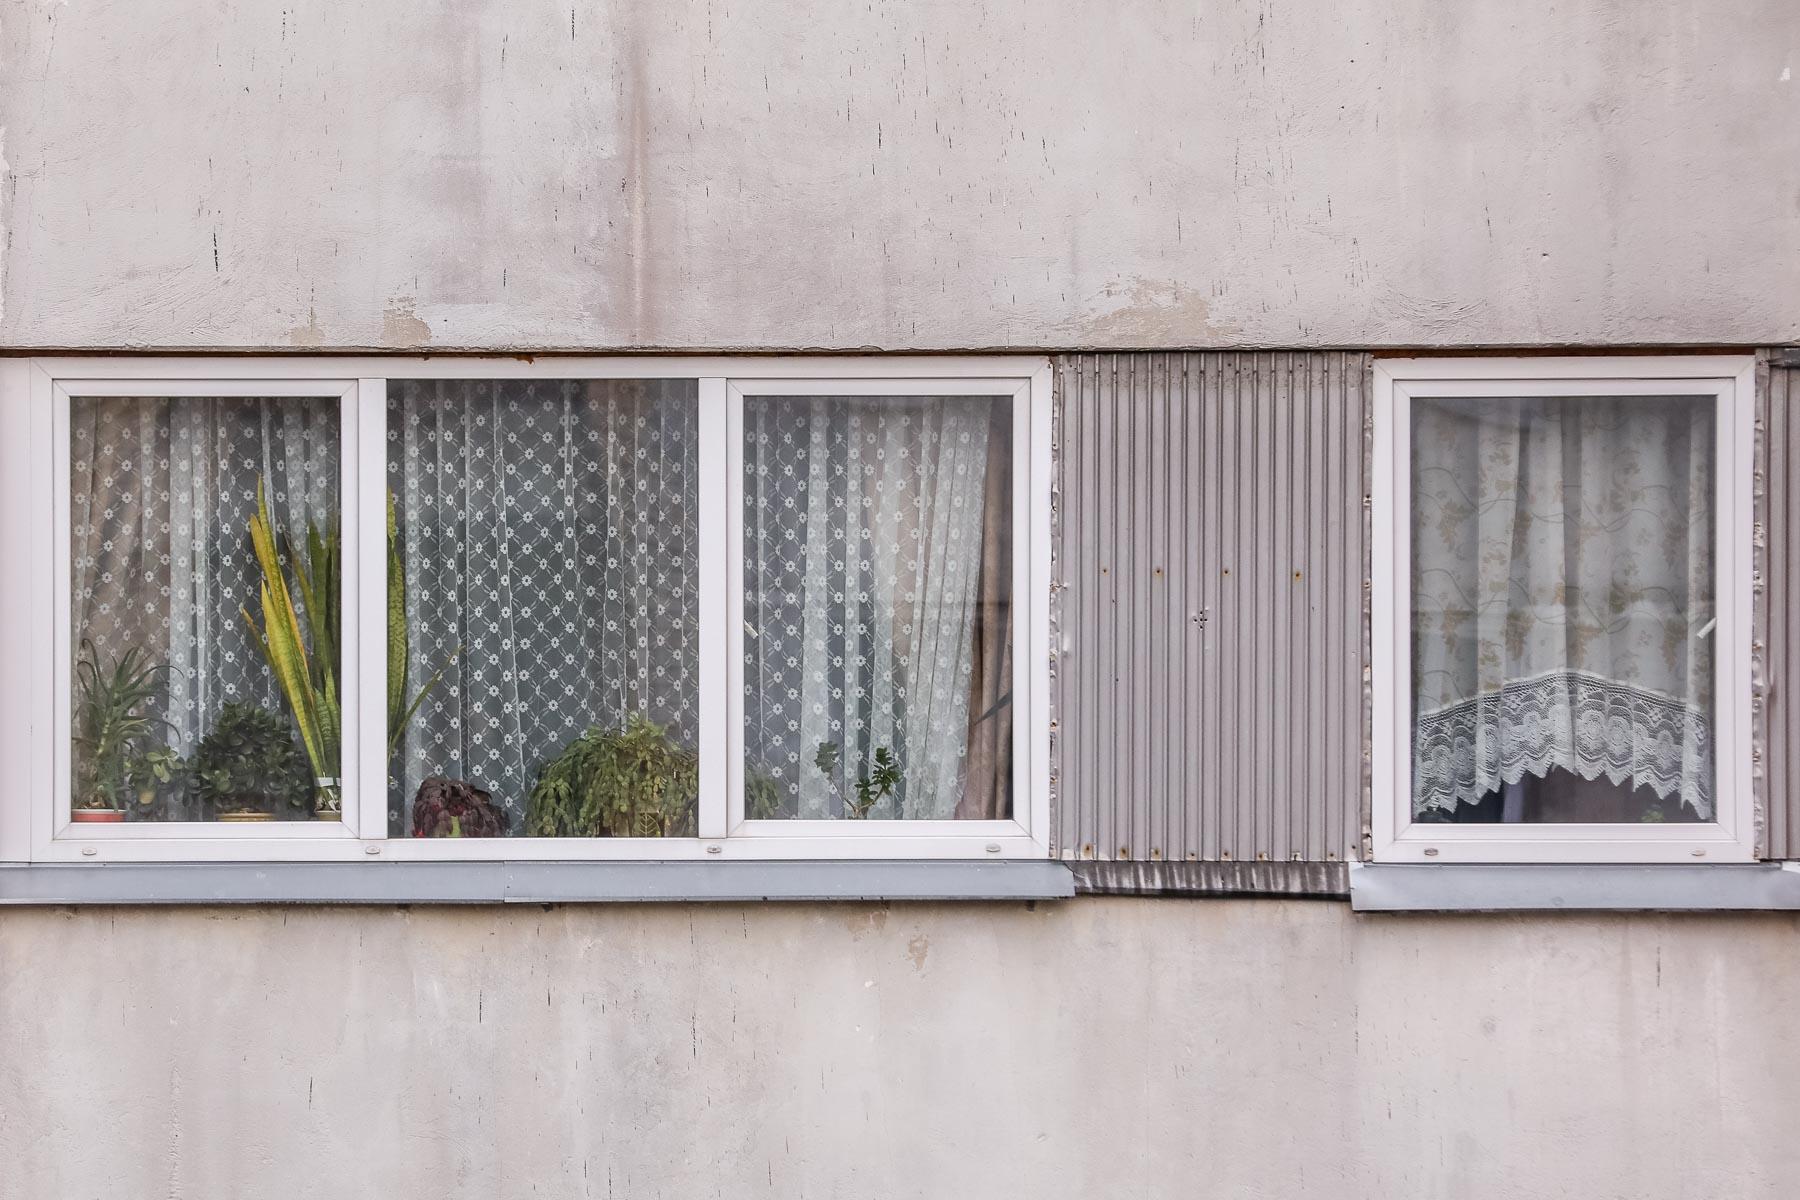 Landscape-cityscape-photography-jelgava-latvia-blocs-blocks-flat-post-soviet--Советские-квартиры-спальный-район-Латвия-город-фотограф-natalia-smith-photography-0037.jpg